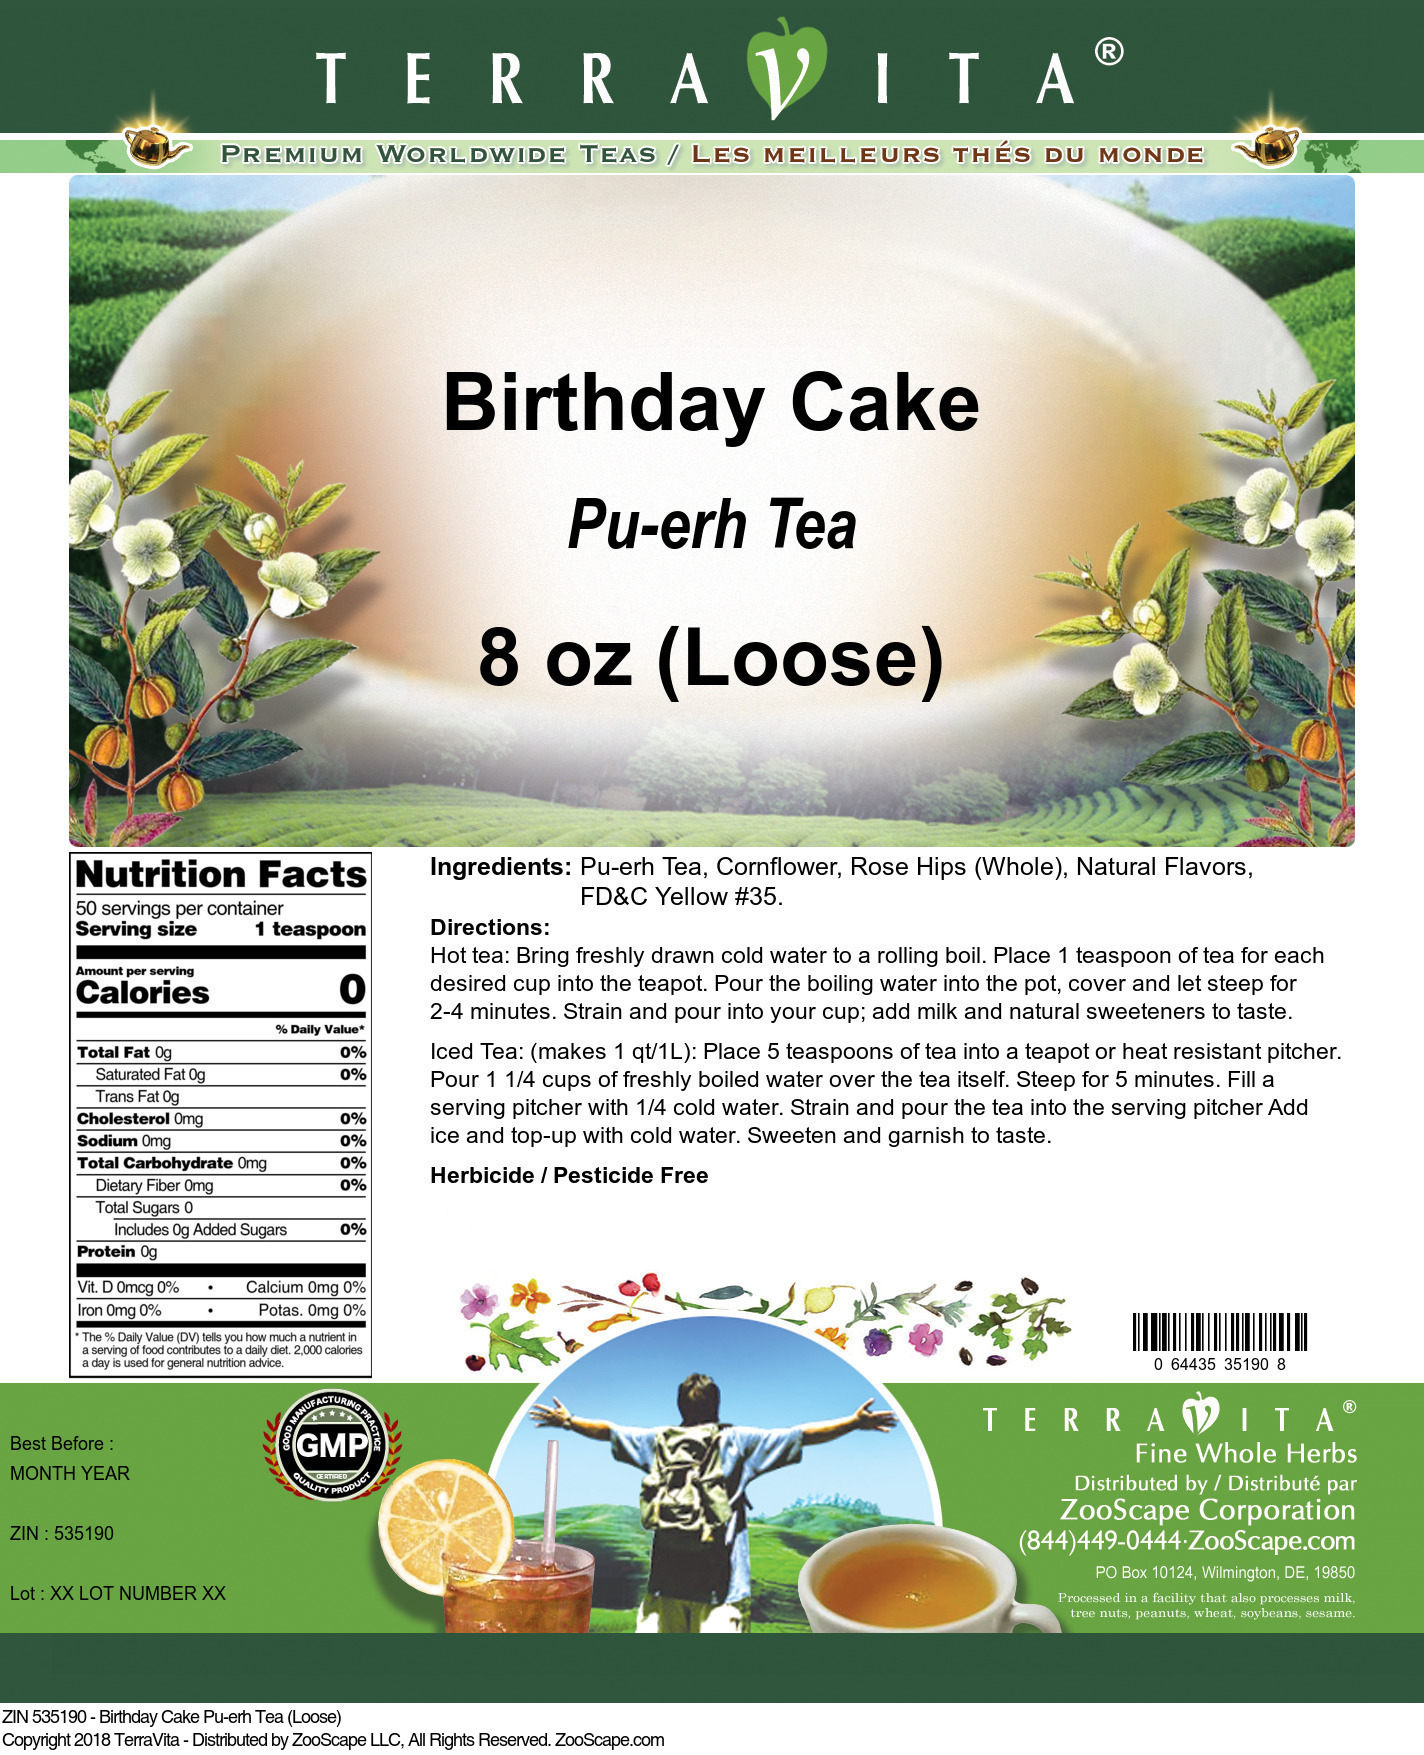 Birthday Cake Pu-erh Tea